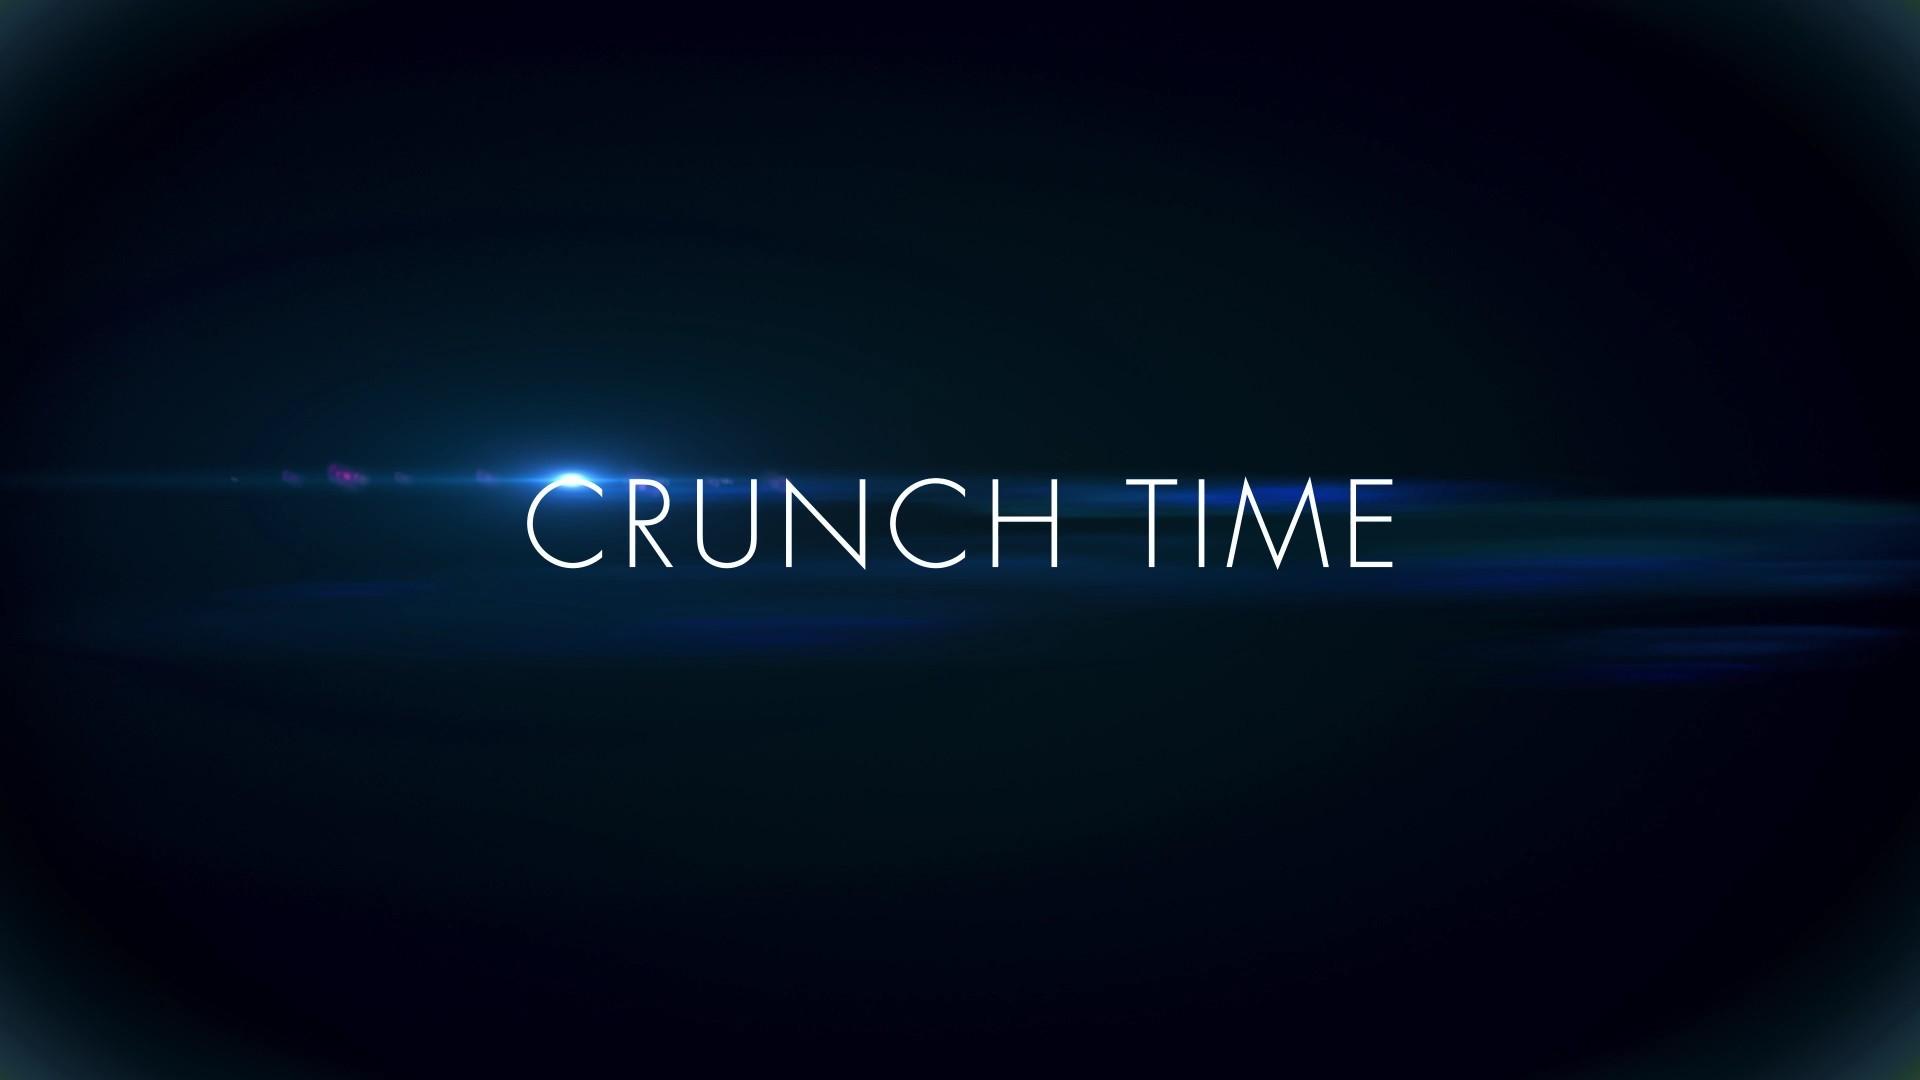 Res: 1920x1080, Crunch Time promo.jpg